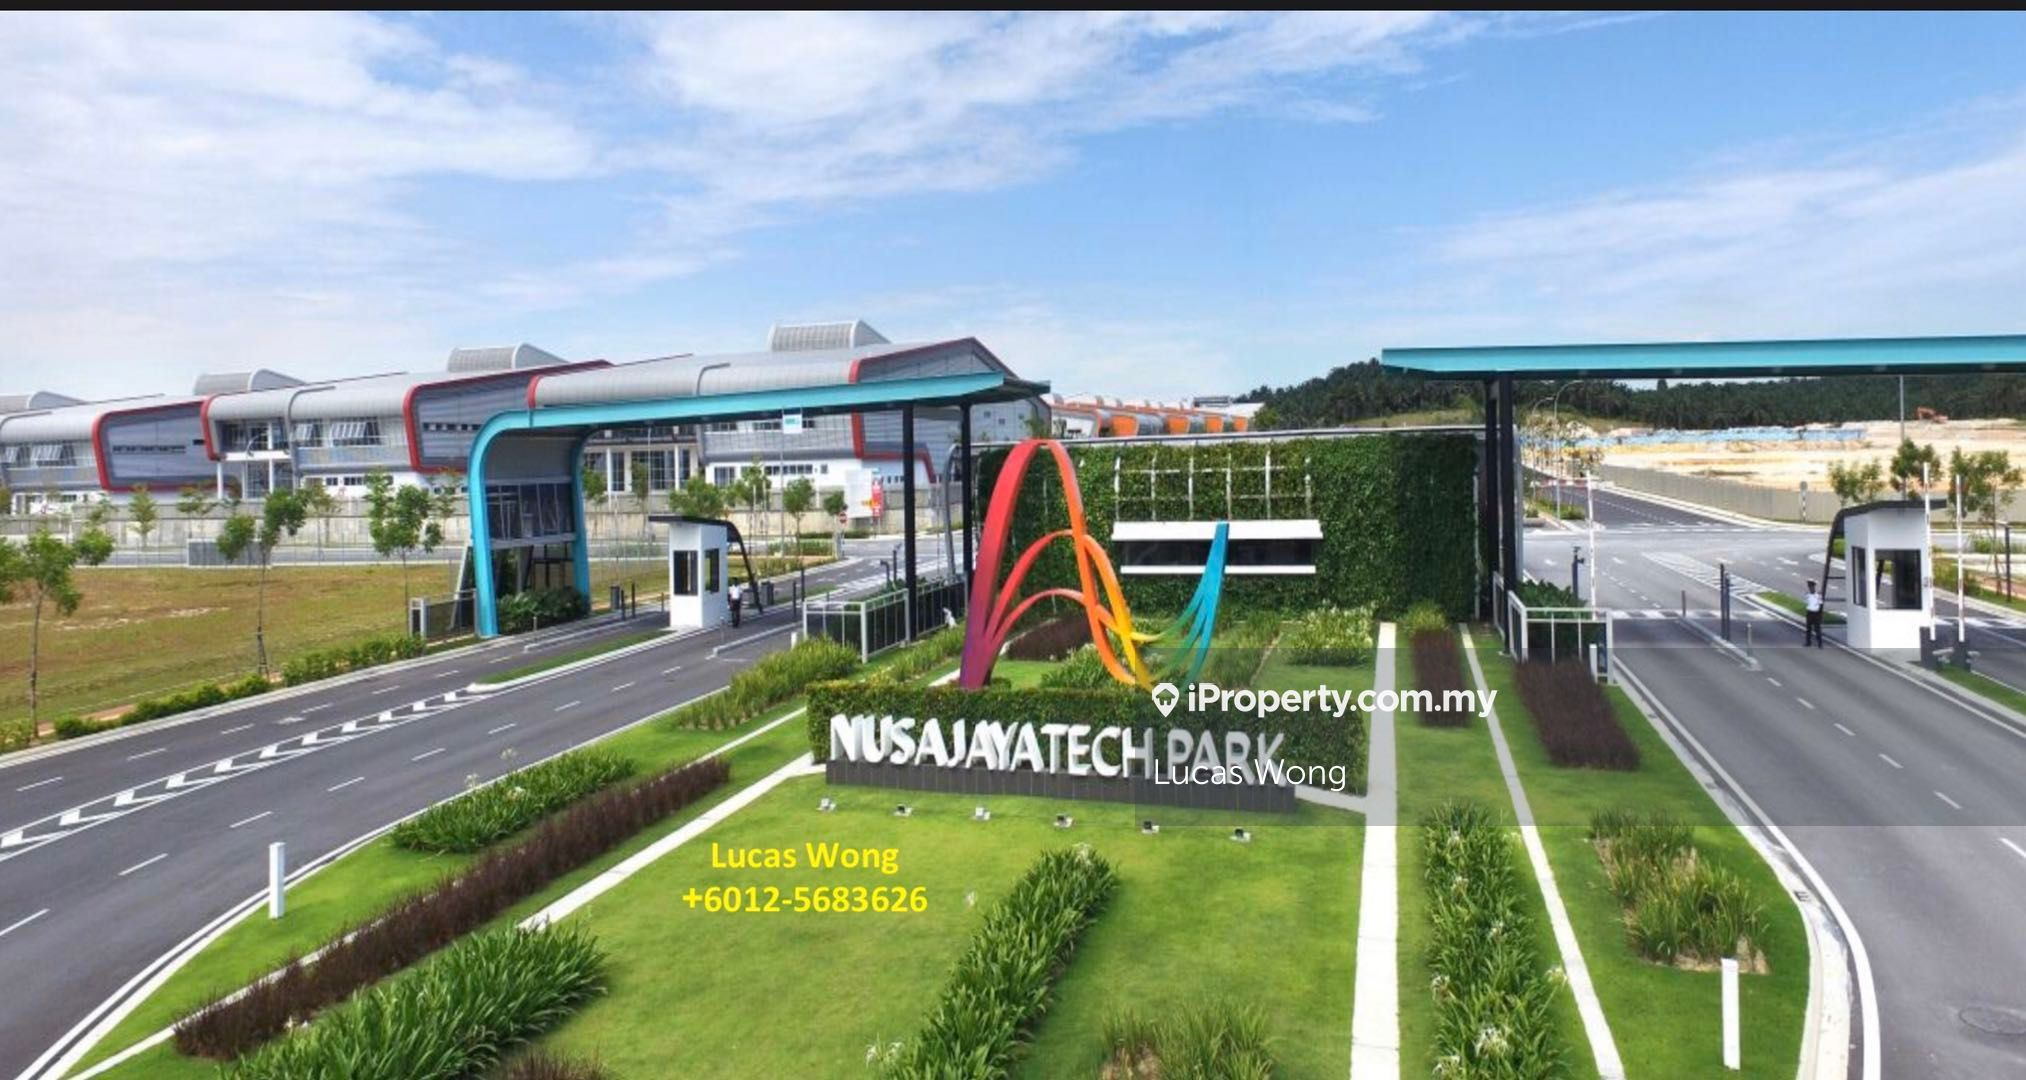 Nusajaya Tech Park @Iskandar Puteri Johor (Nusajaya), Iskandar Puteri (Nusajaya)